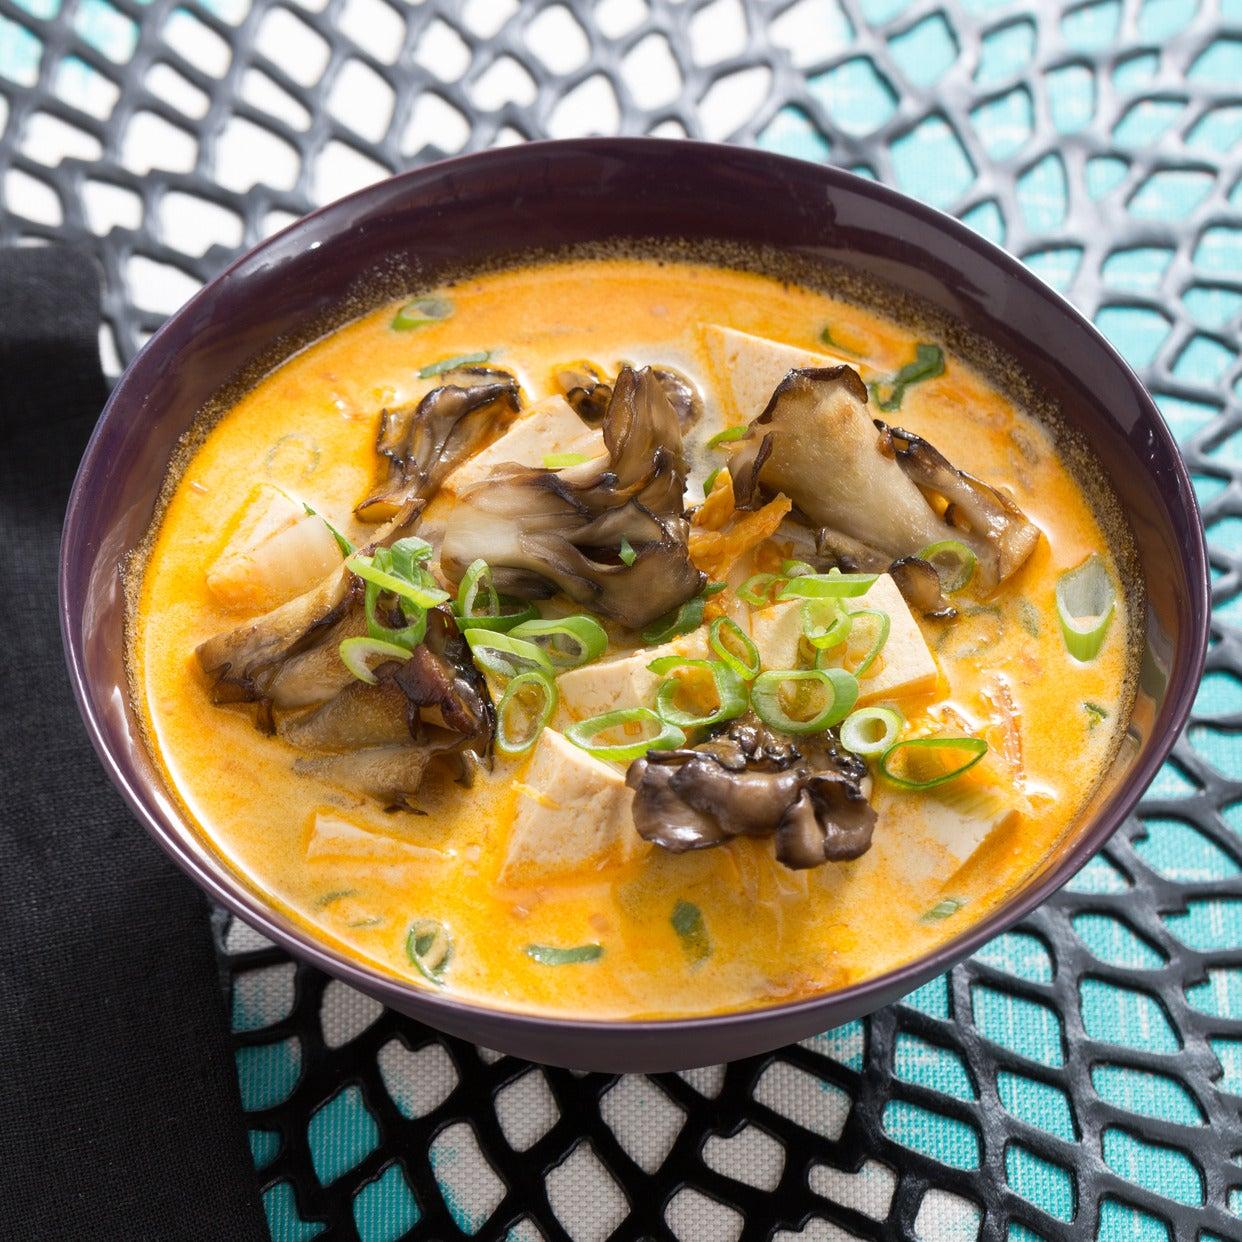 Vegetarian Tom Yum Soup with Napa Cabbage & Tofu